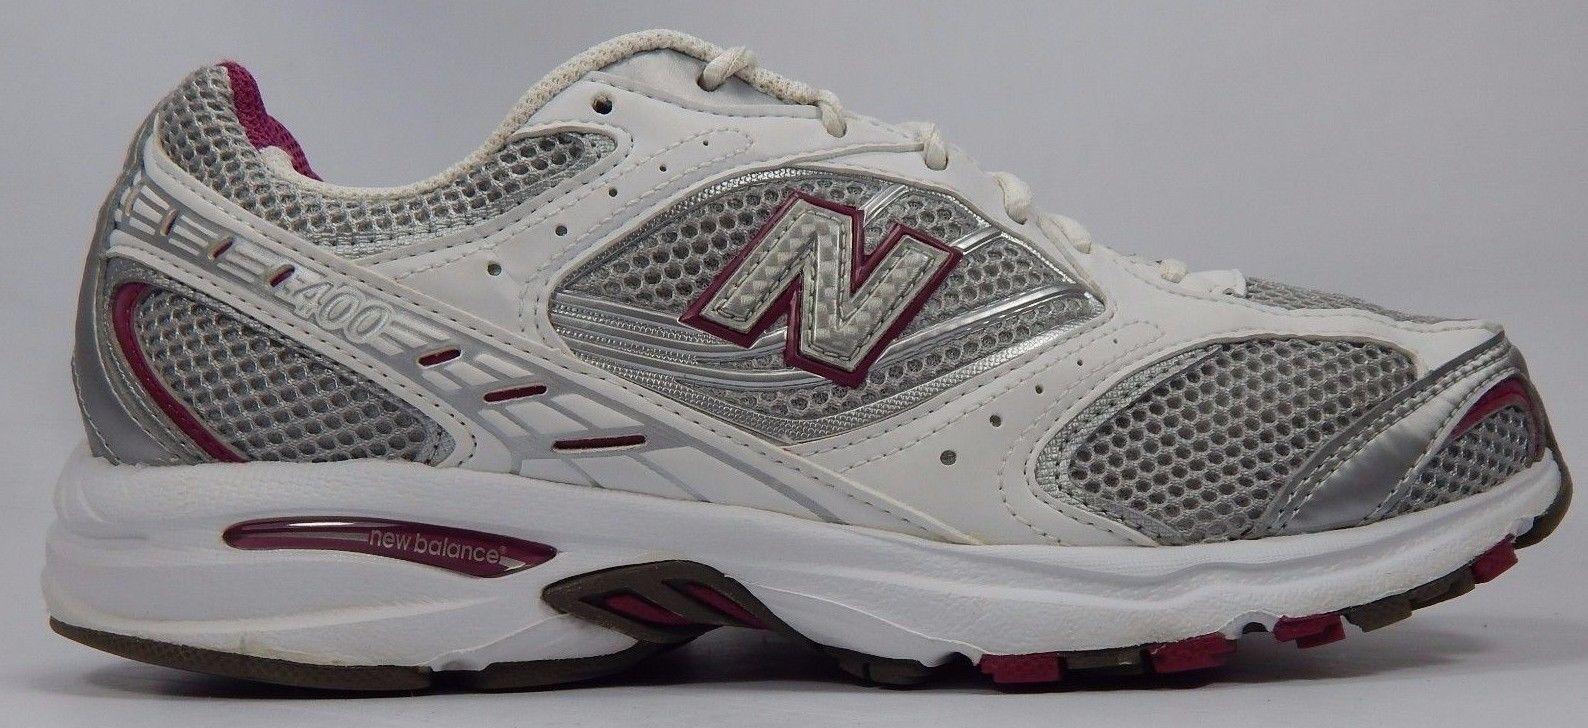 New Balance 400 Women's Running Shoes Size US 10 M (B) EU 41.5 Silver WR400SWP